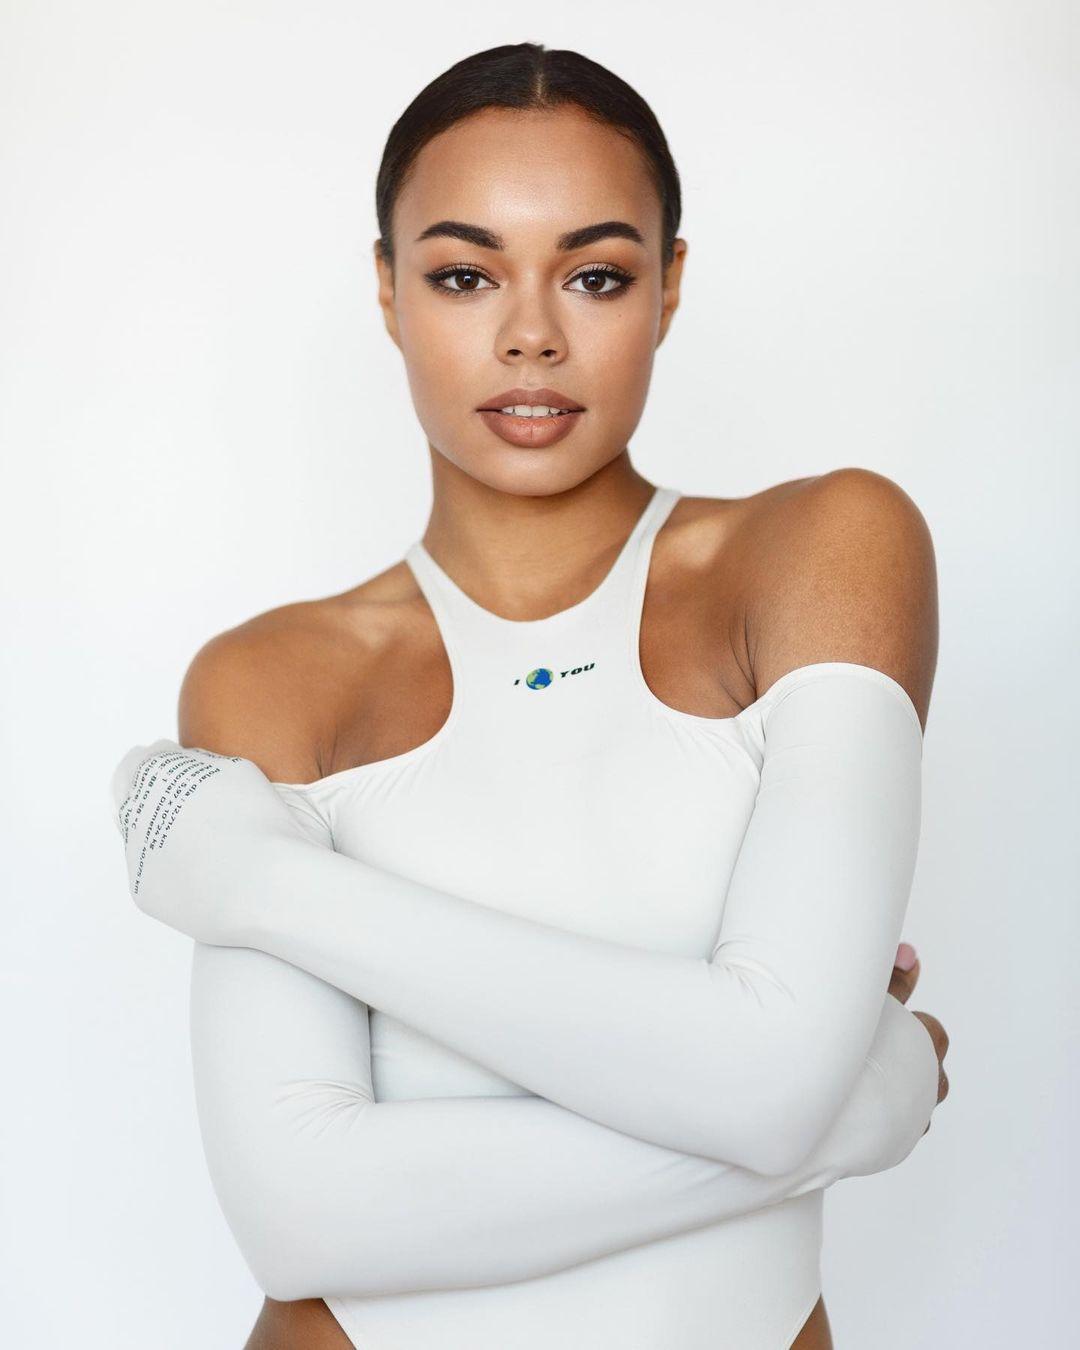 candidatas a miss universe ukraine 2021. final: 15 oct. - Página 2 5f1BiQ